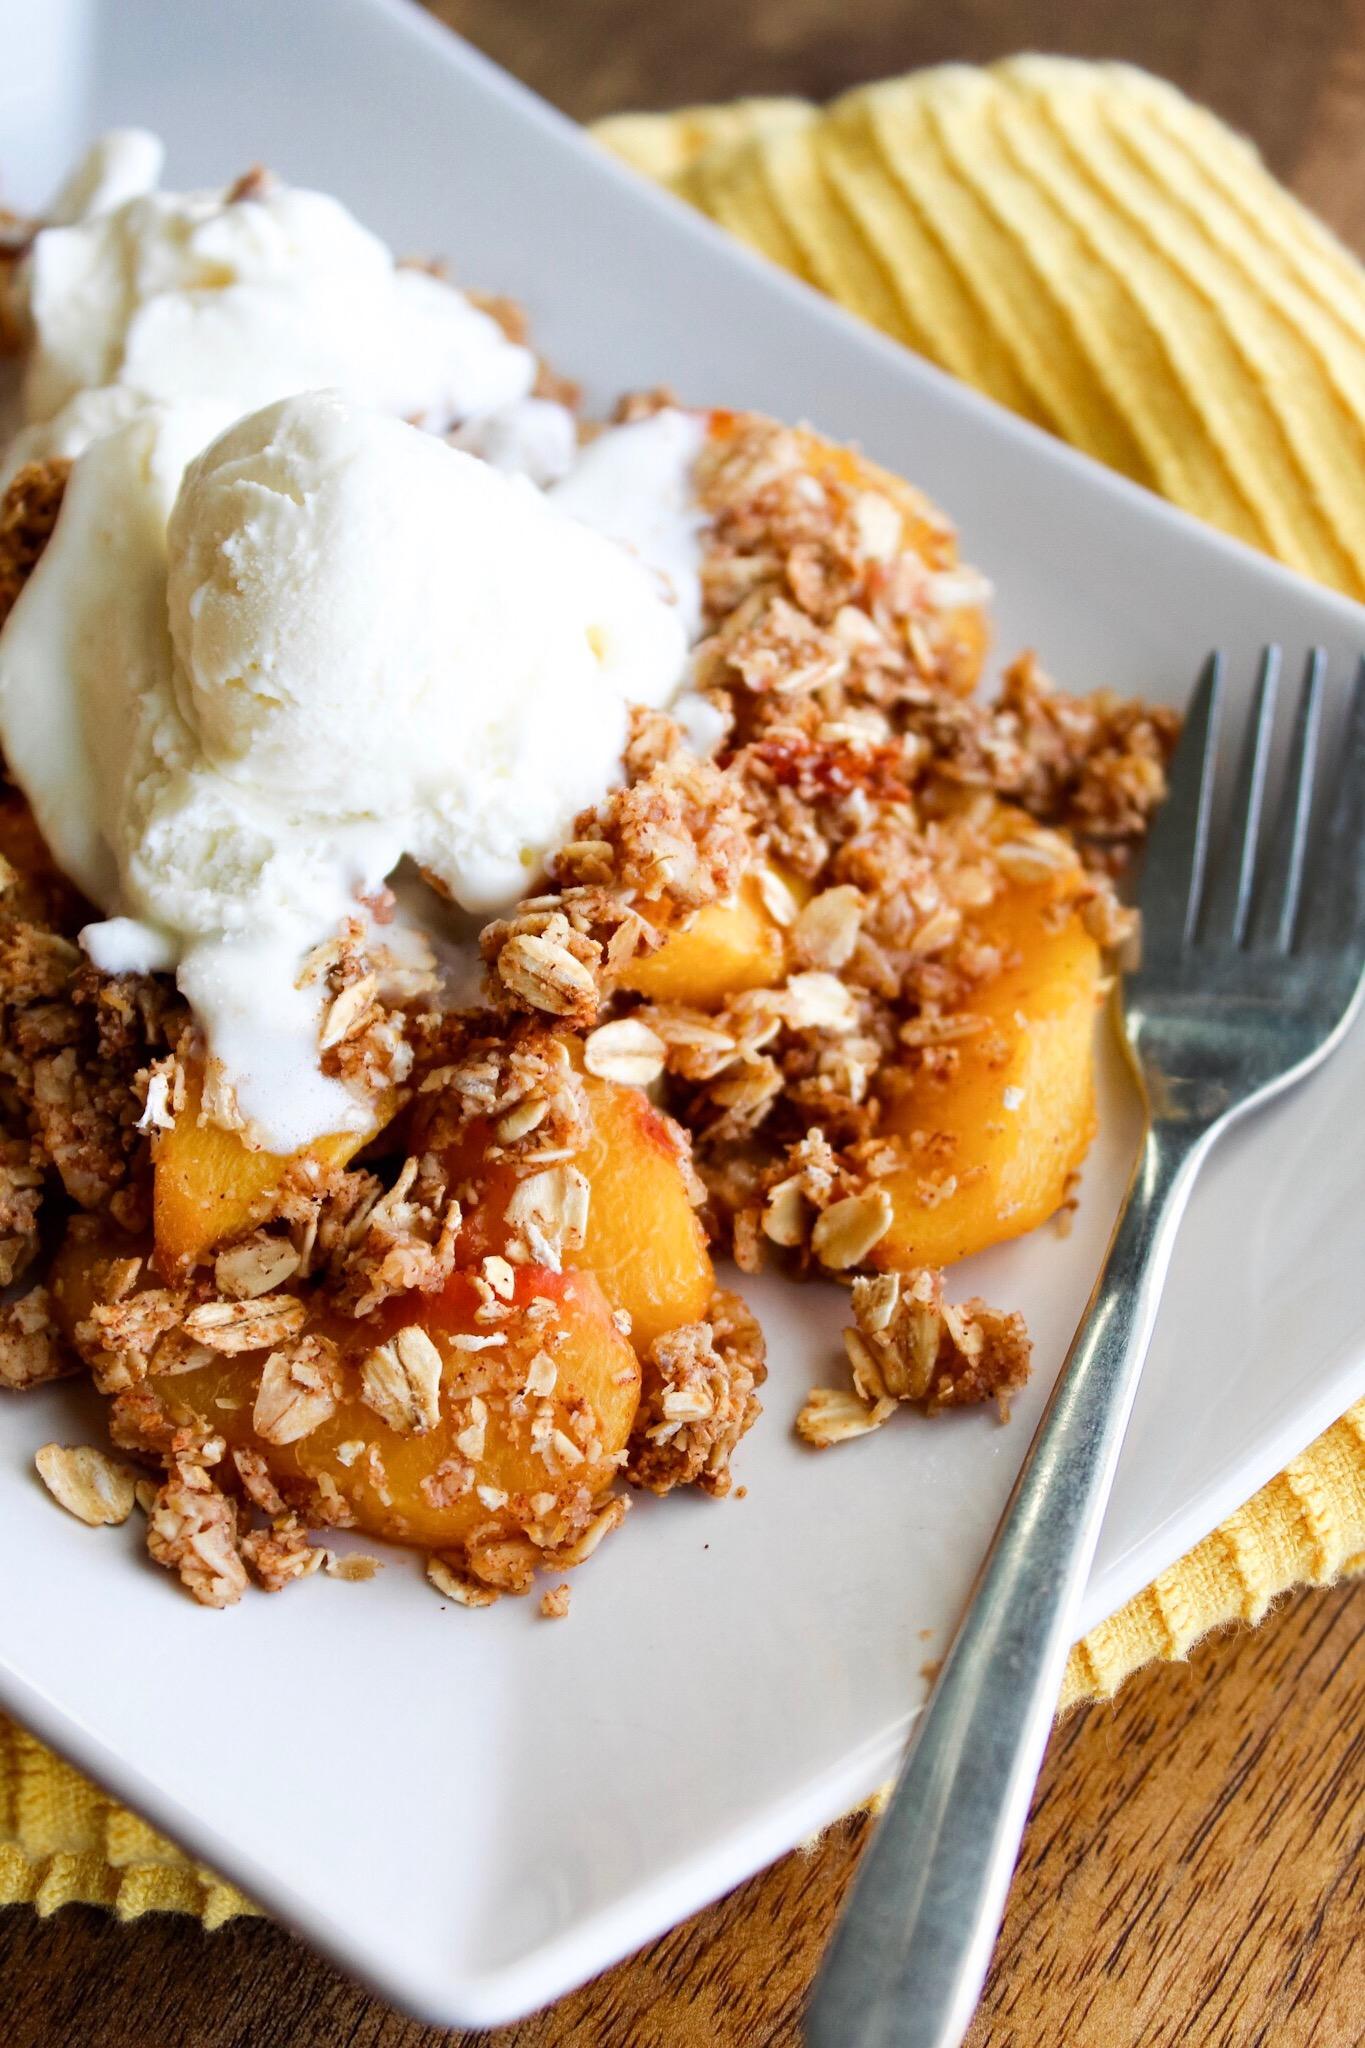 PEACH CRISP - Makes 12 servingsCalories per serving: 235 caloriesMacros per serving: 7F / 39C / 6P*Macros without ice cream